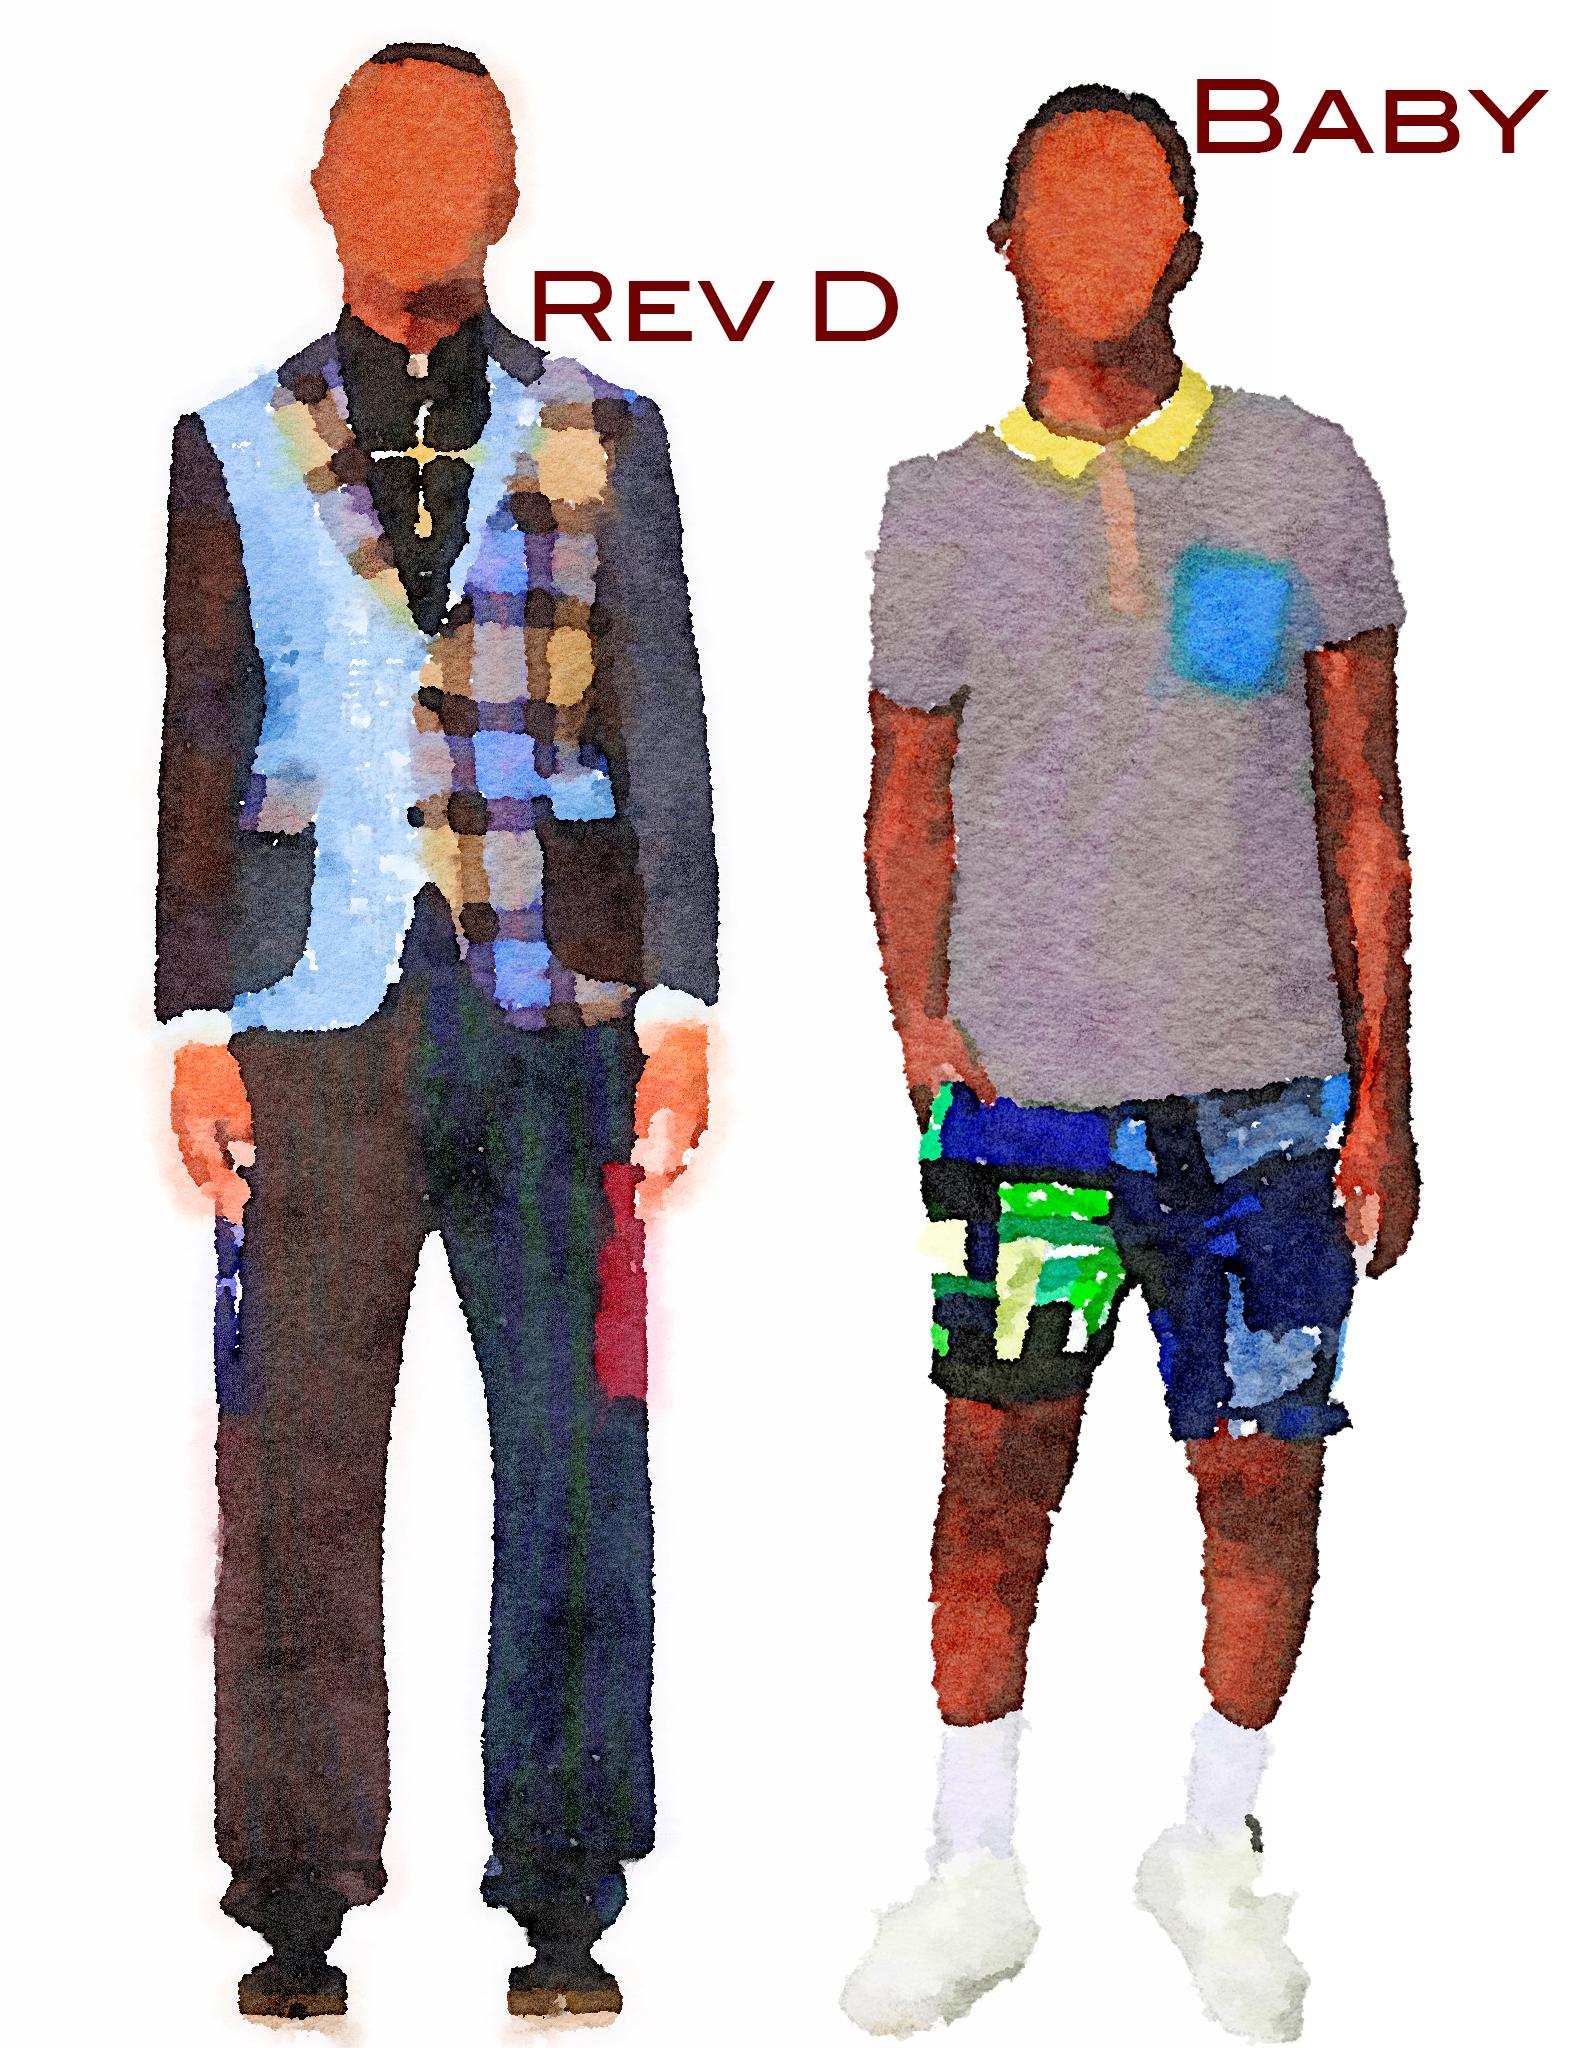 Rev D Baby .jpg